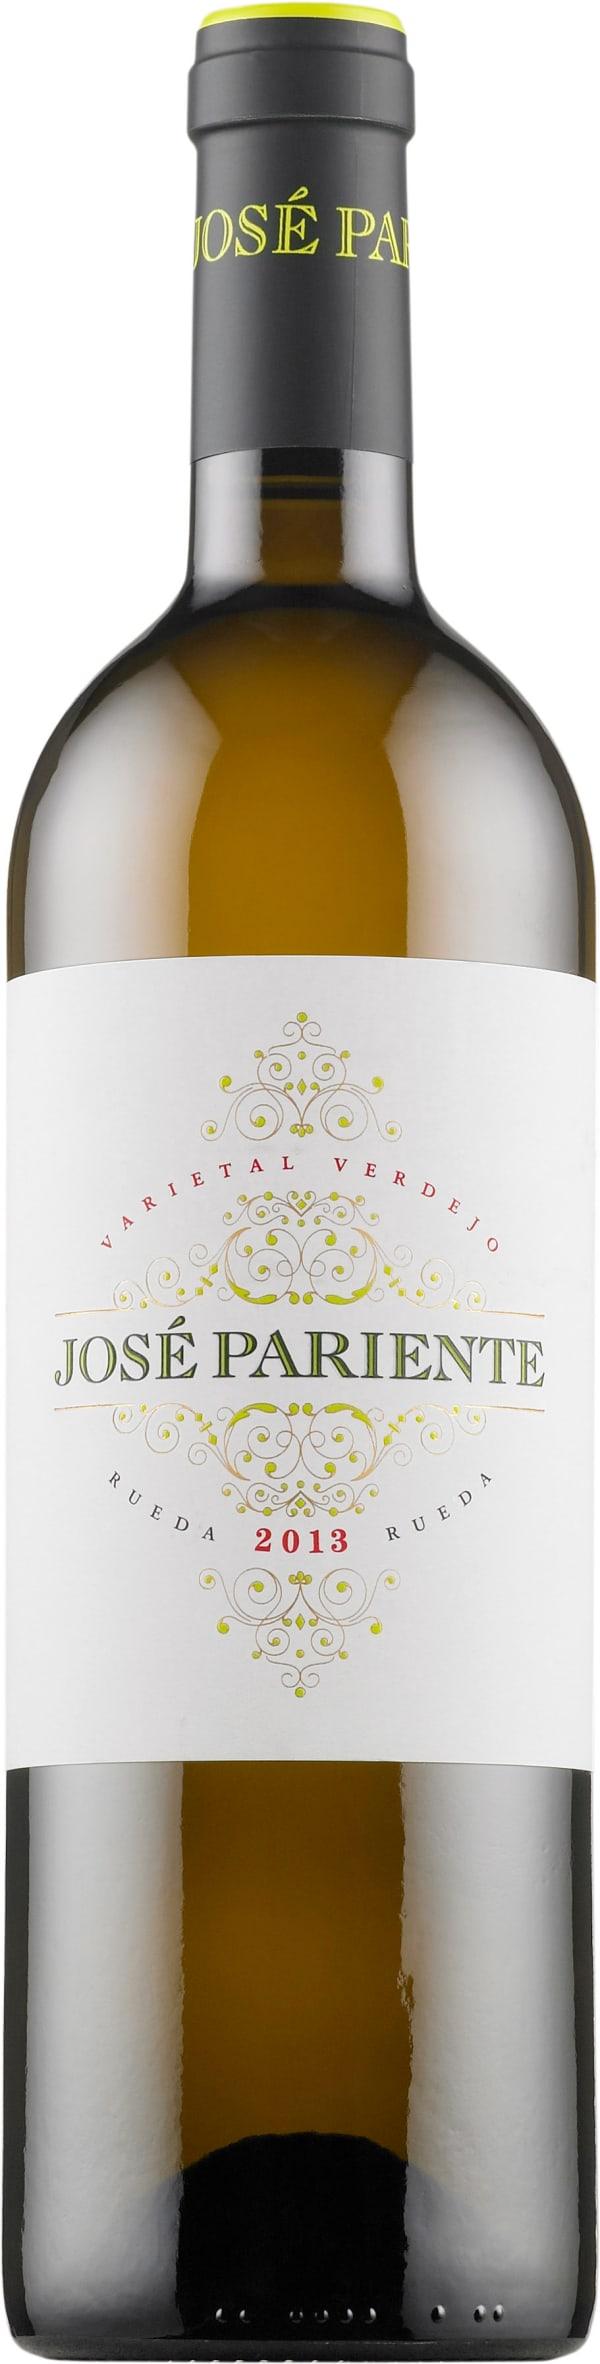 José Pariente Varietal Verdejo 2017